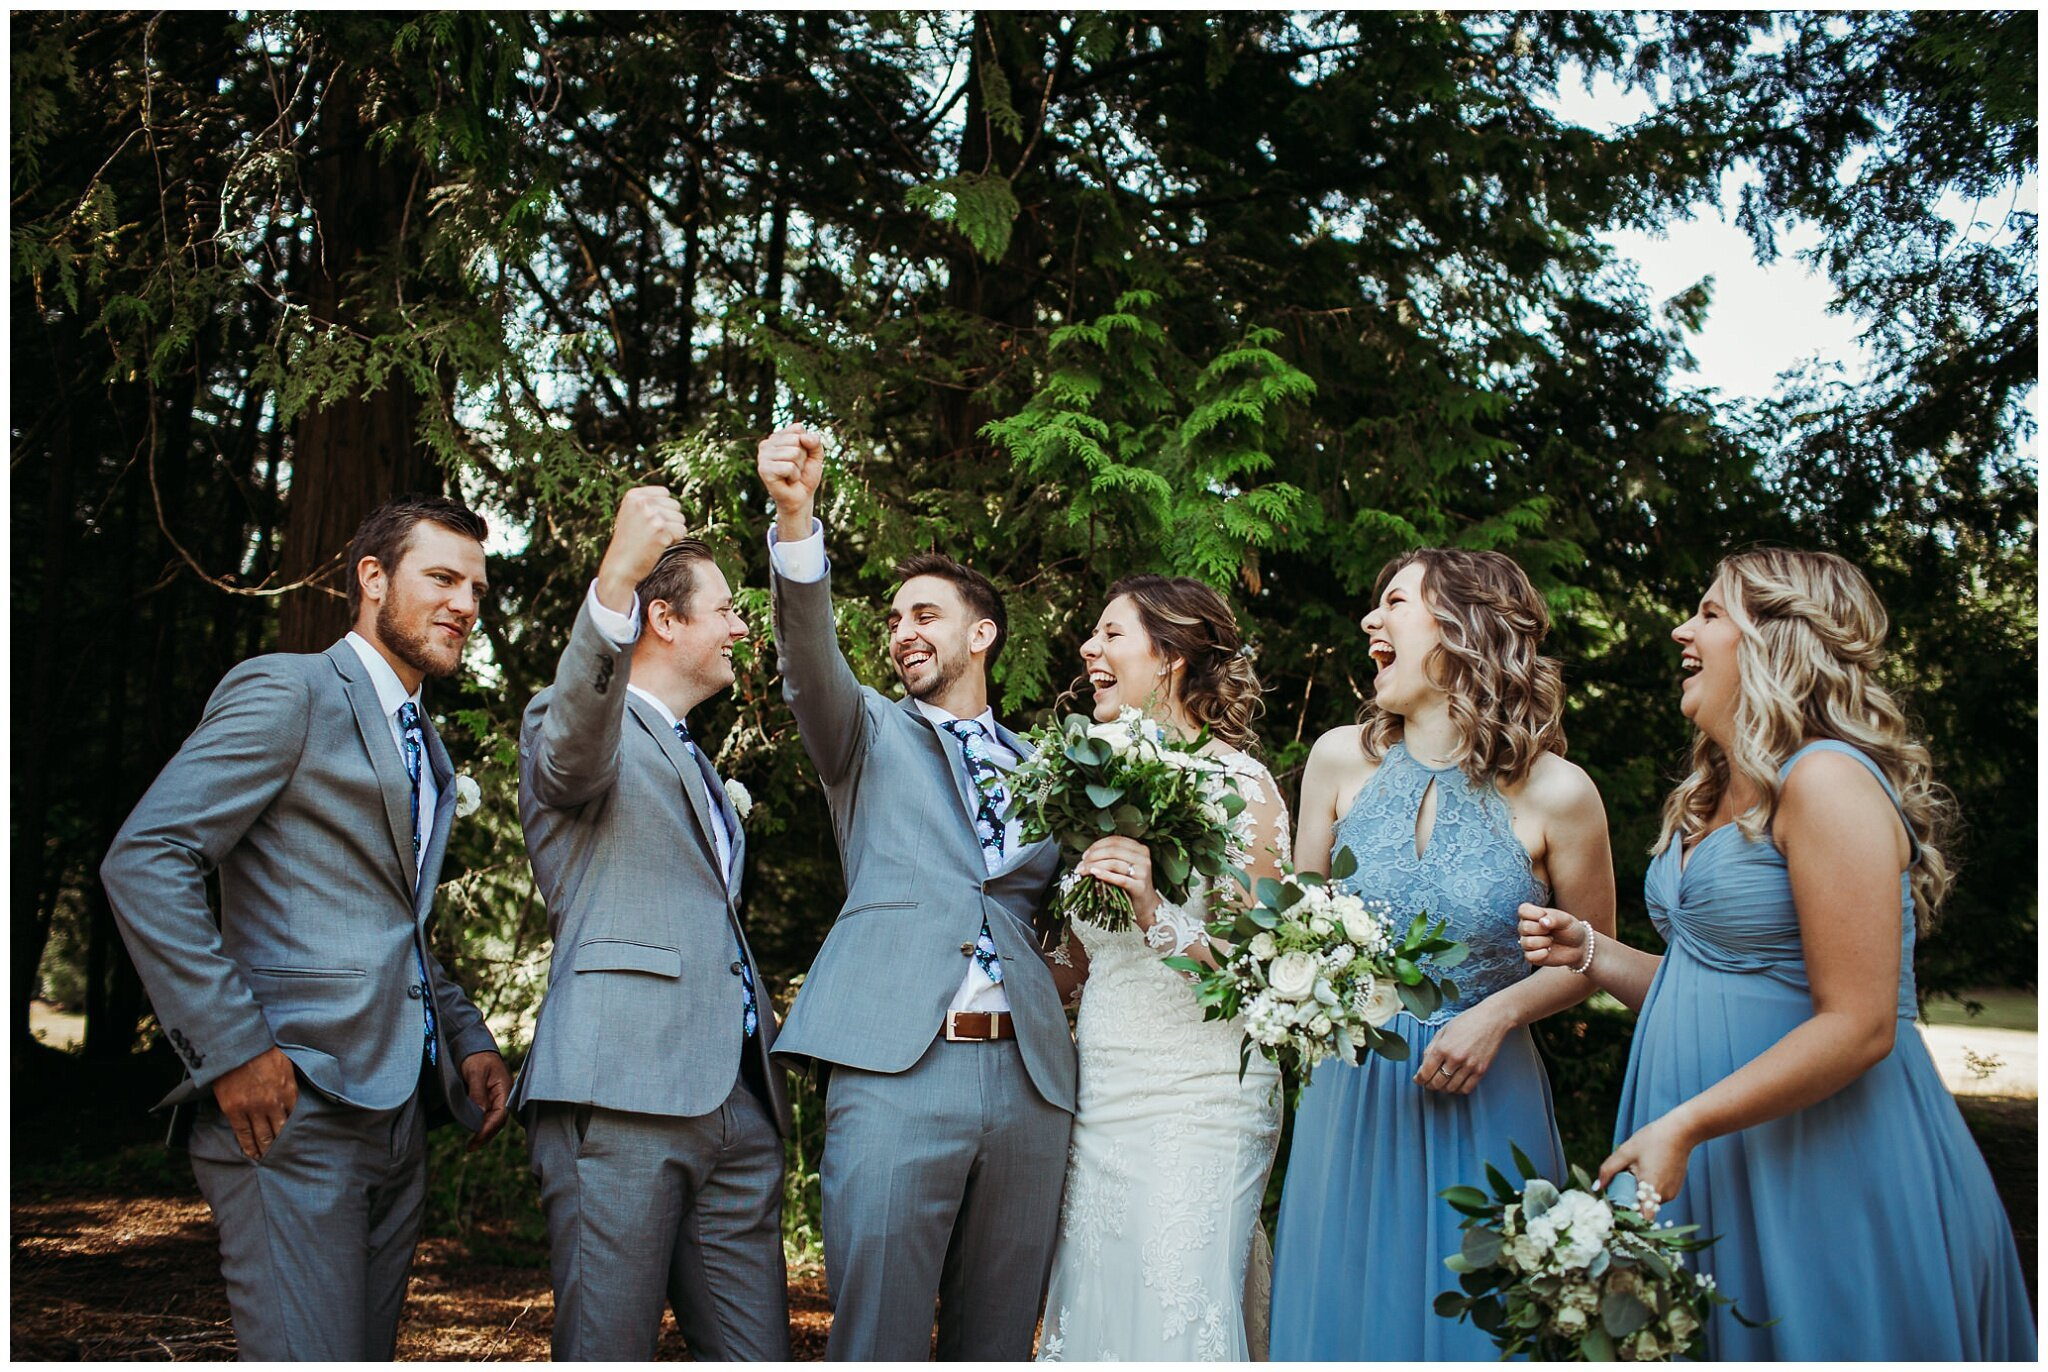 Eighteen Pastures Mission  BC Abbotsford BC Christian Wedding Photographer Summer Bride Groom Inspo_0022.jpg